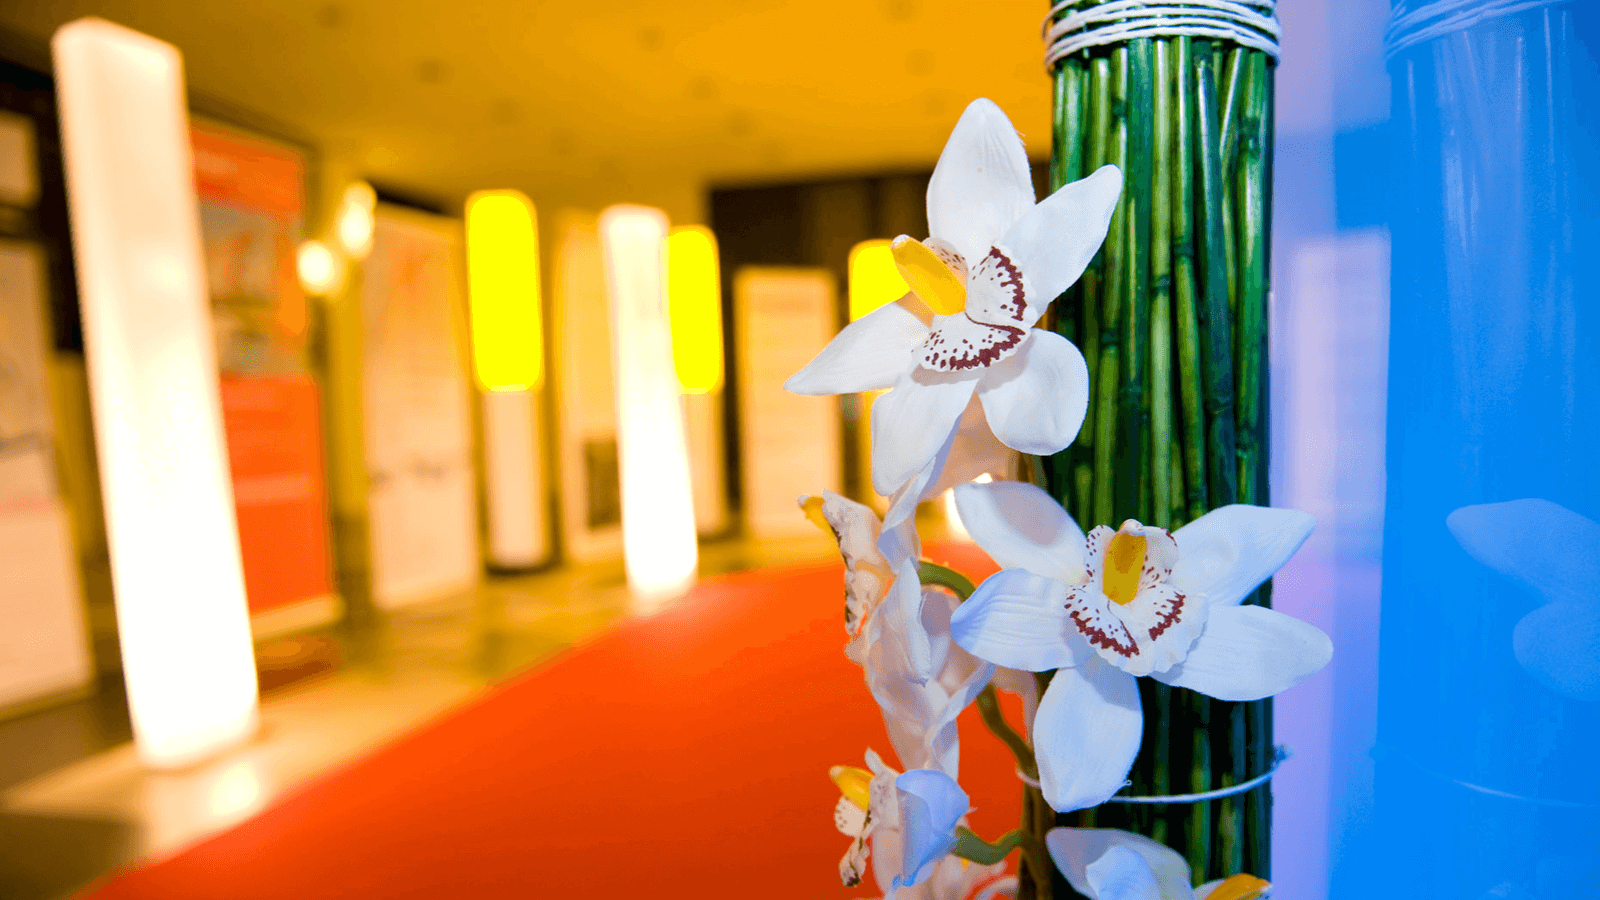 dekoration-vermieten-event-deko-gala-kongress-firmenfest-kundenevent-eventagentur-emotion.company